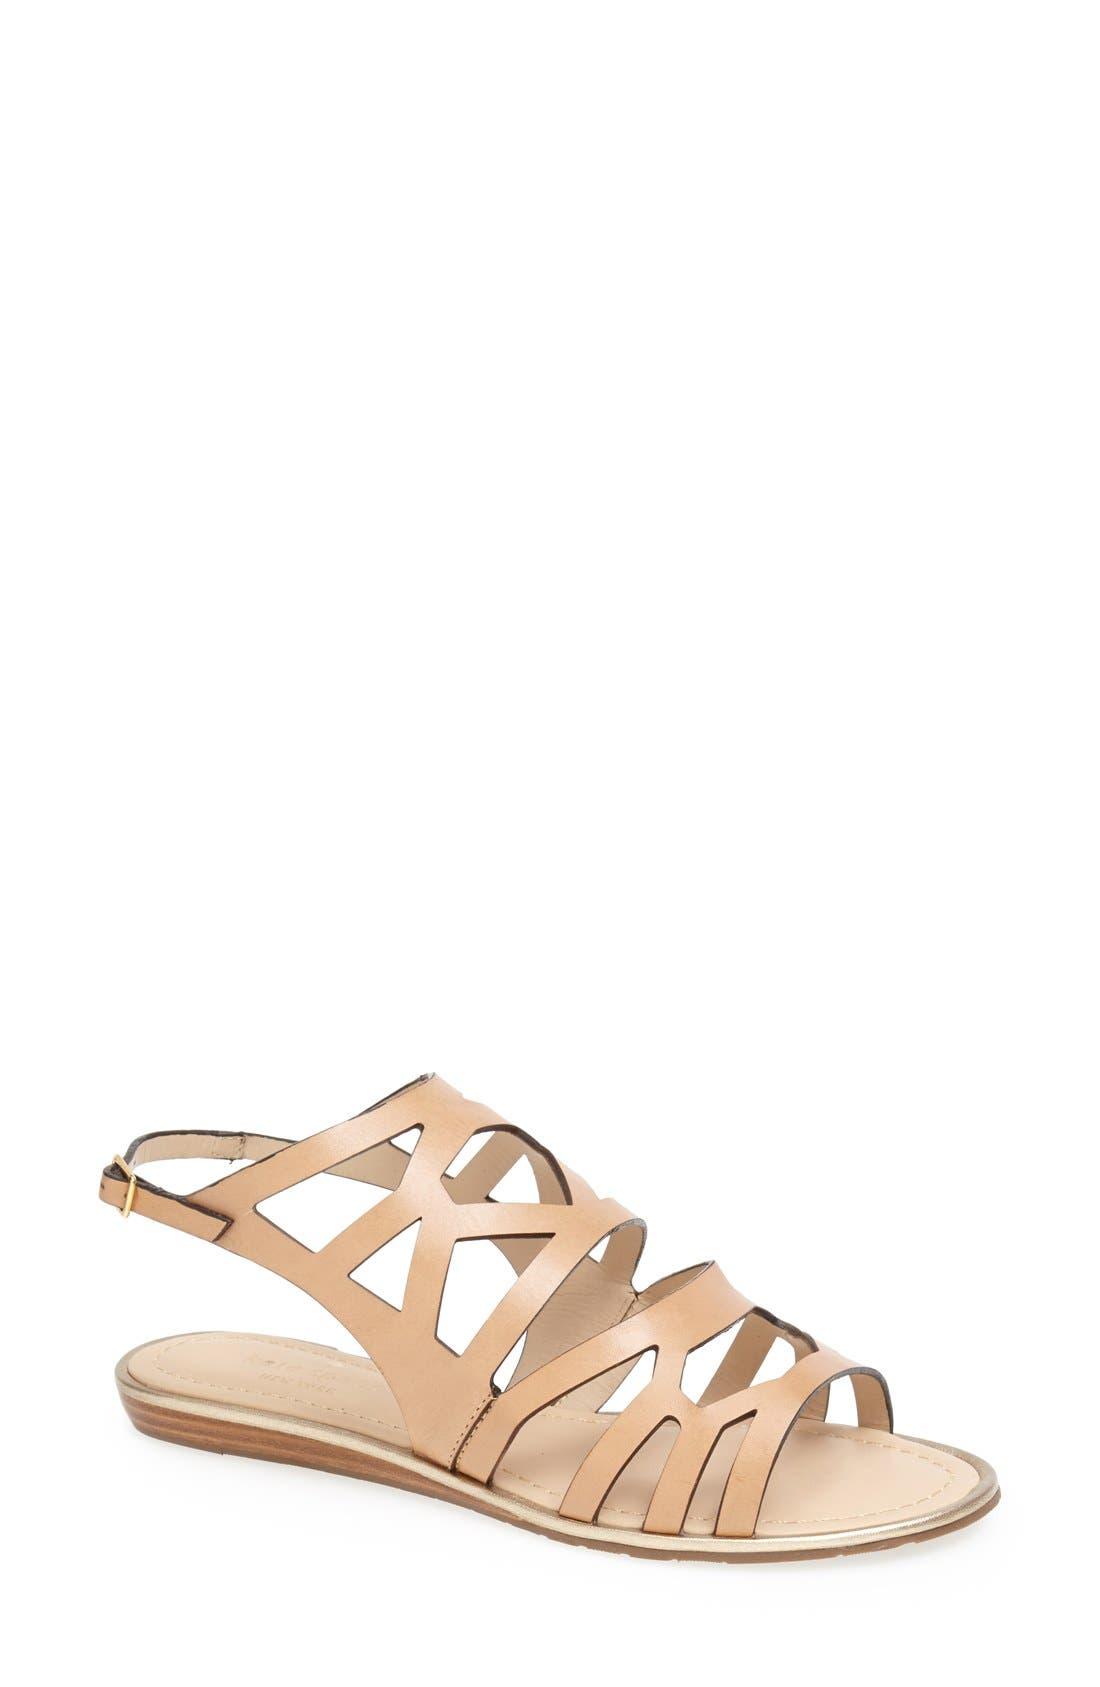 Alternate Image 1 Selected - kate spade new york 'aster' flat sandal